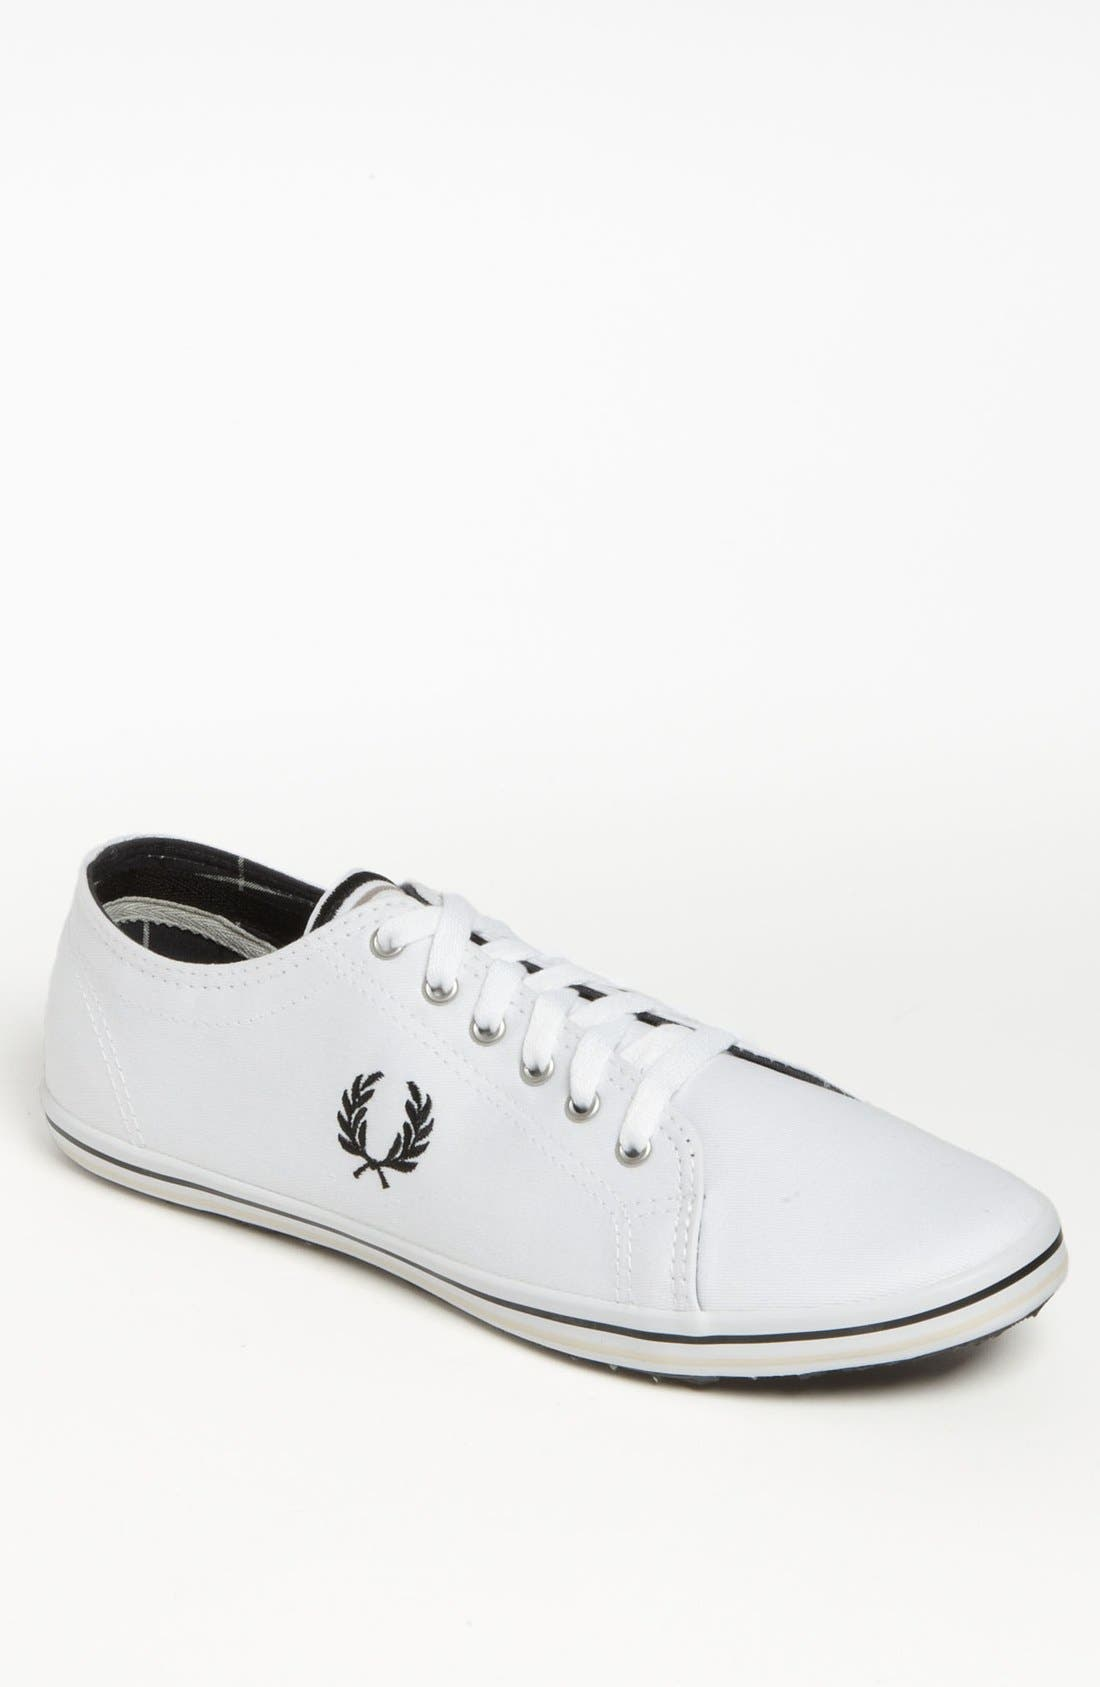 Alternate Image 1 Selected - Fred Perry 'Kingston' Sneaker (Men)